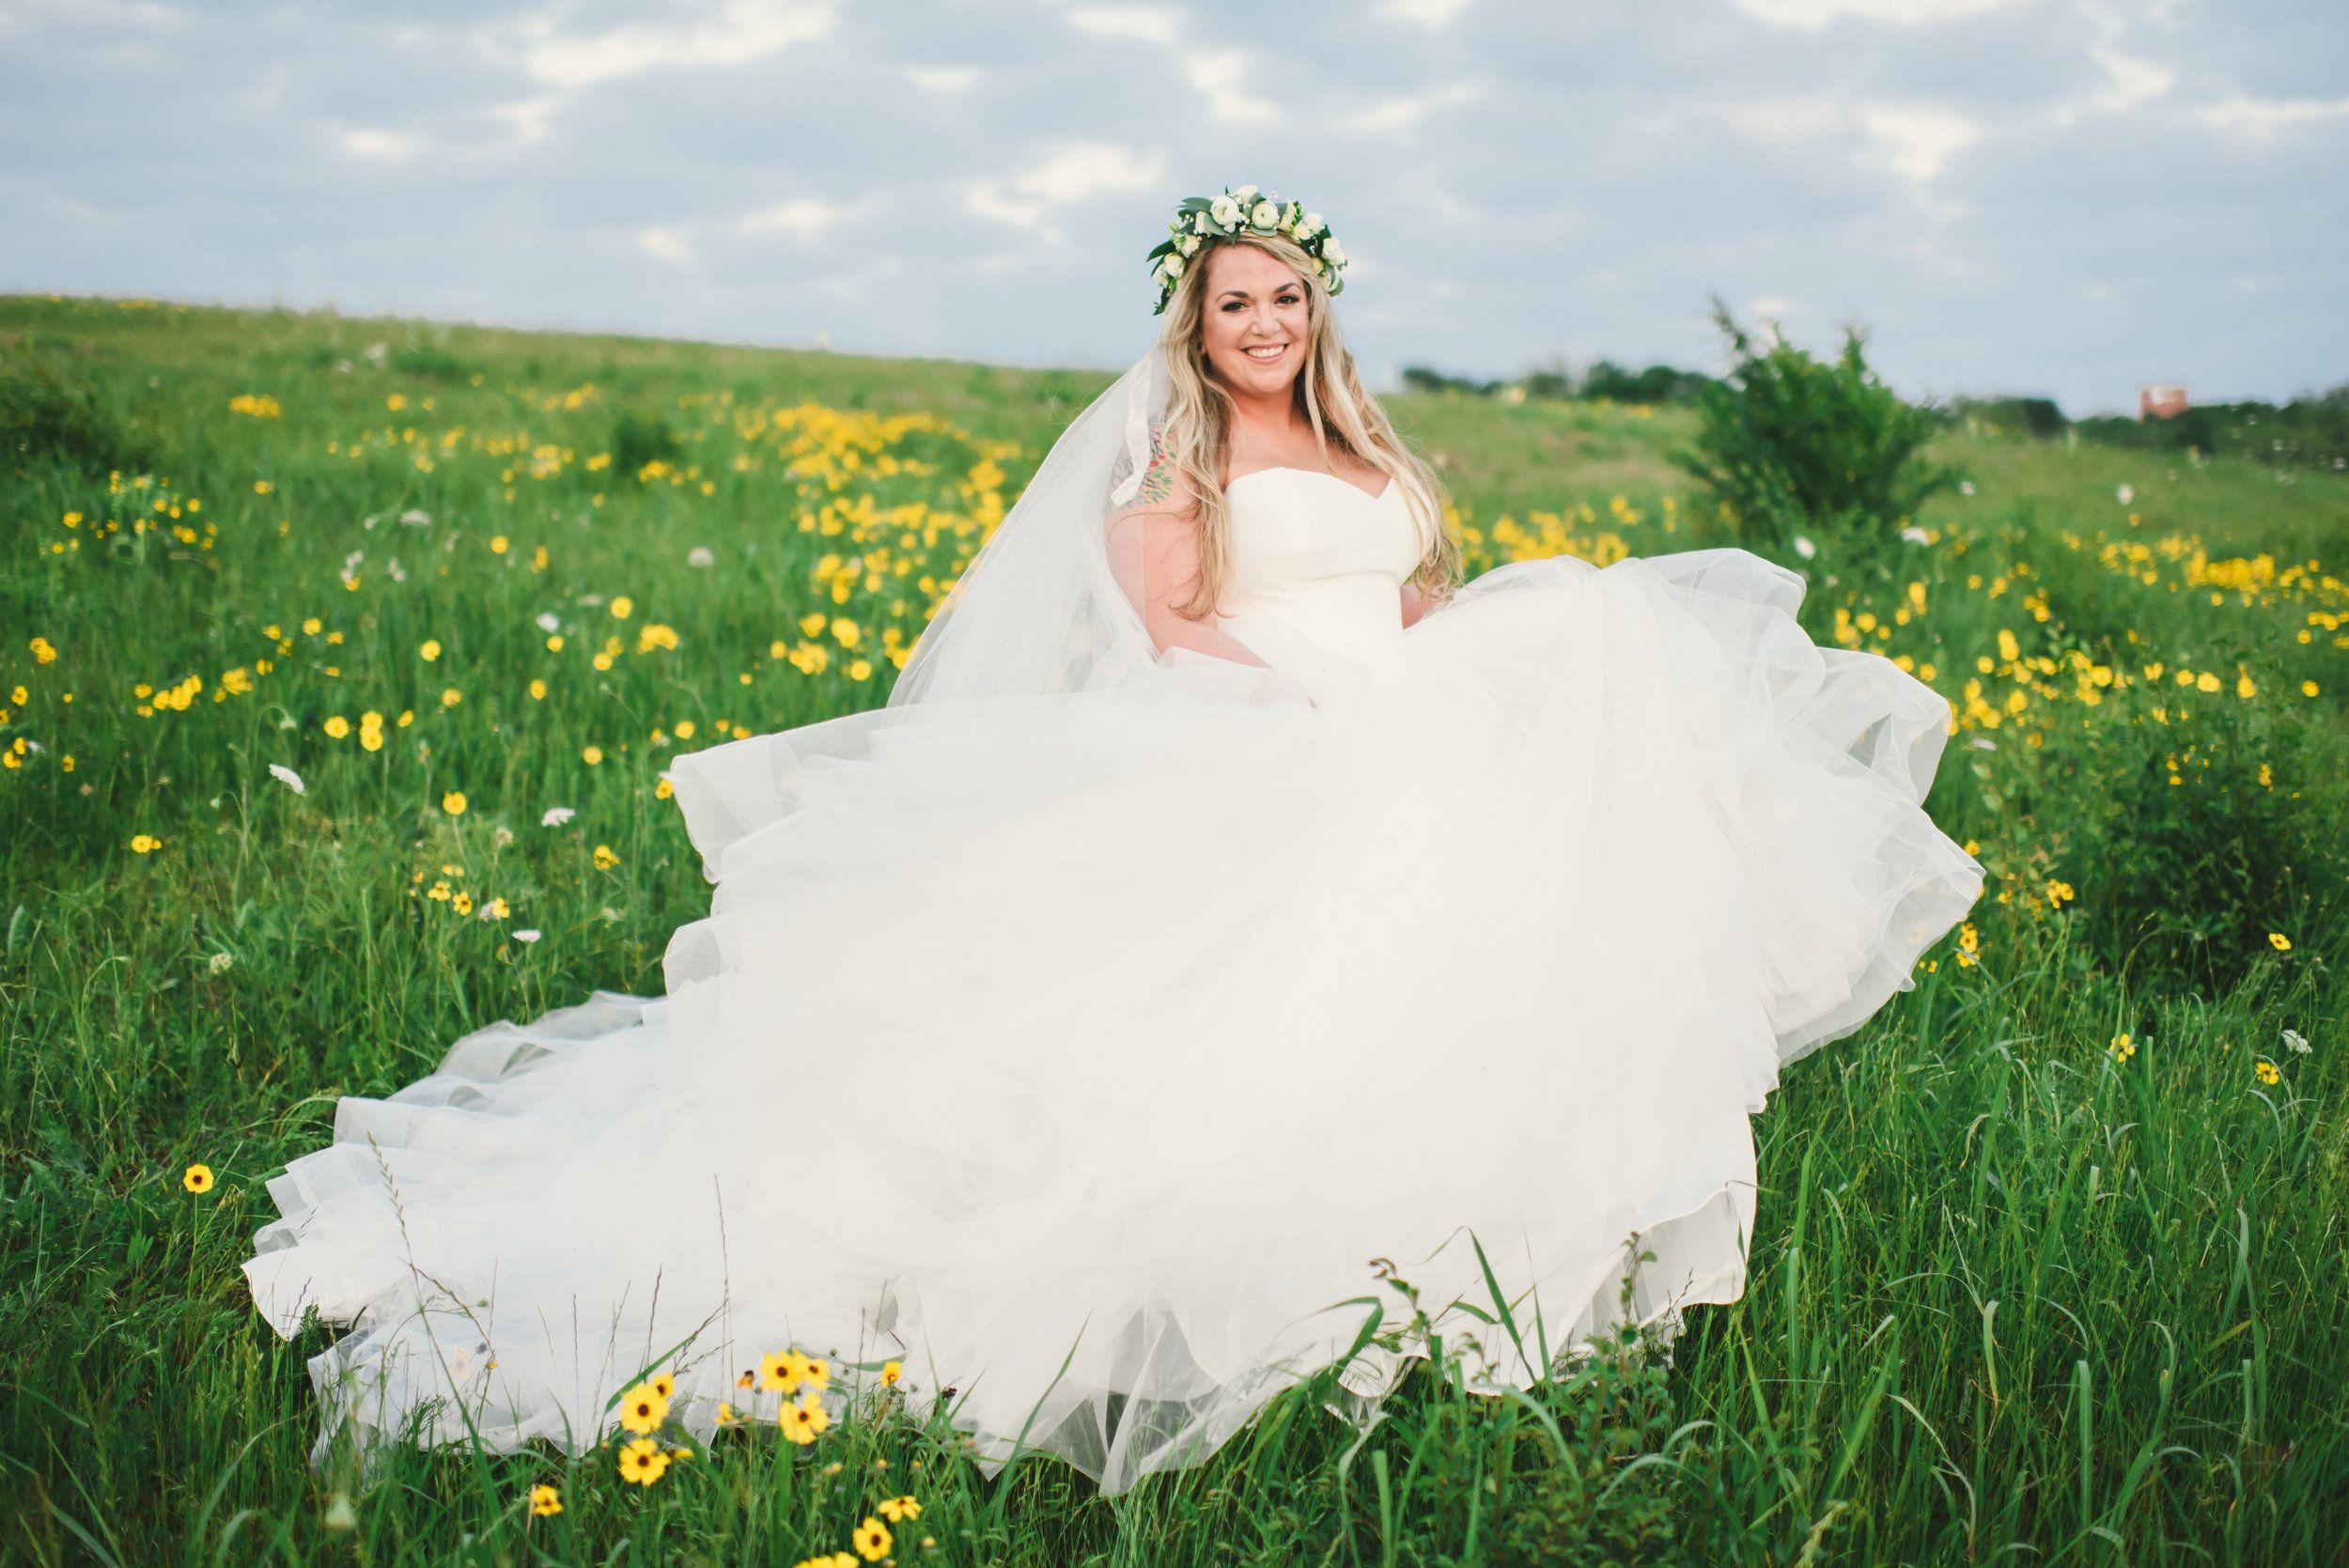 Springtime bridal portrait field of daisy's photo shoot ...